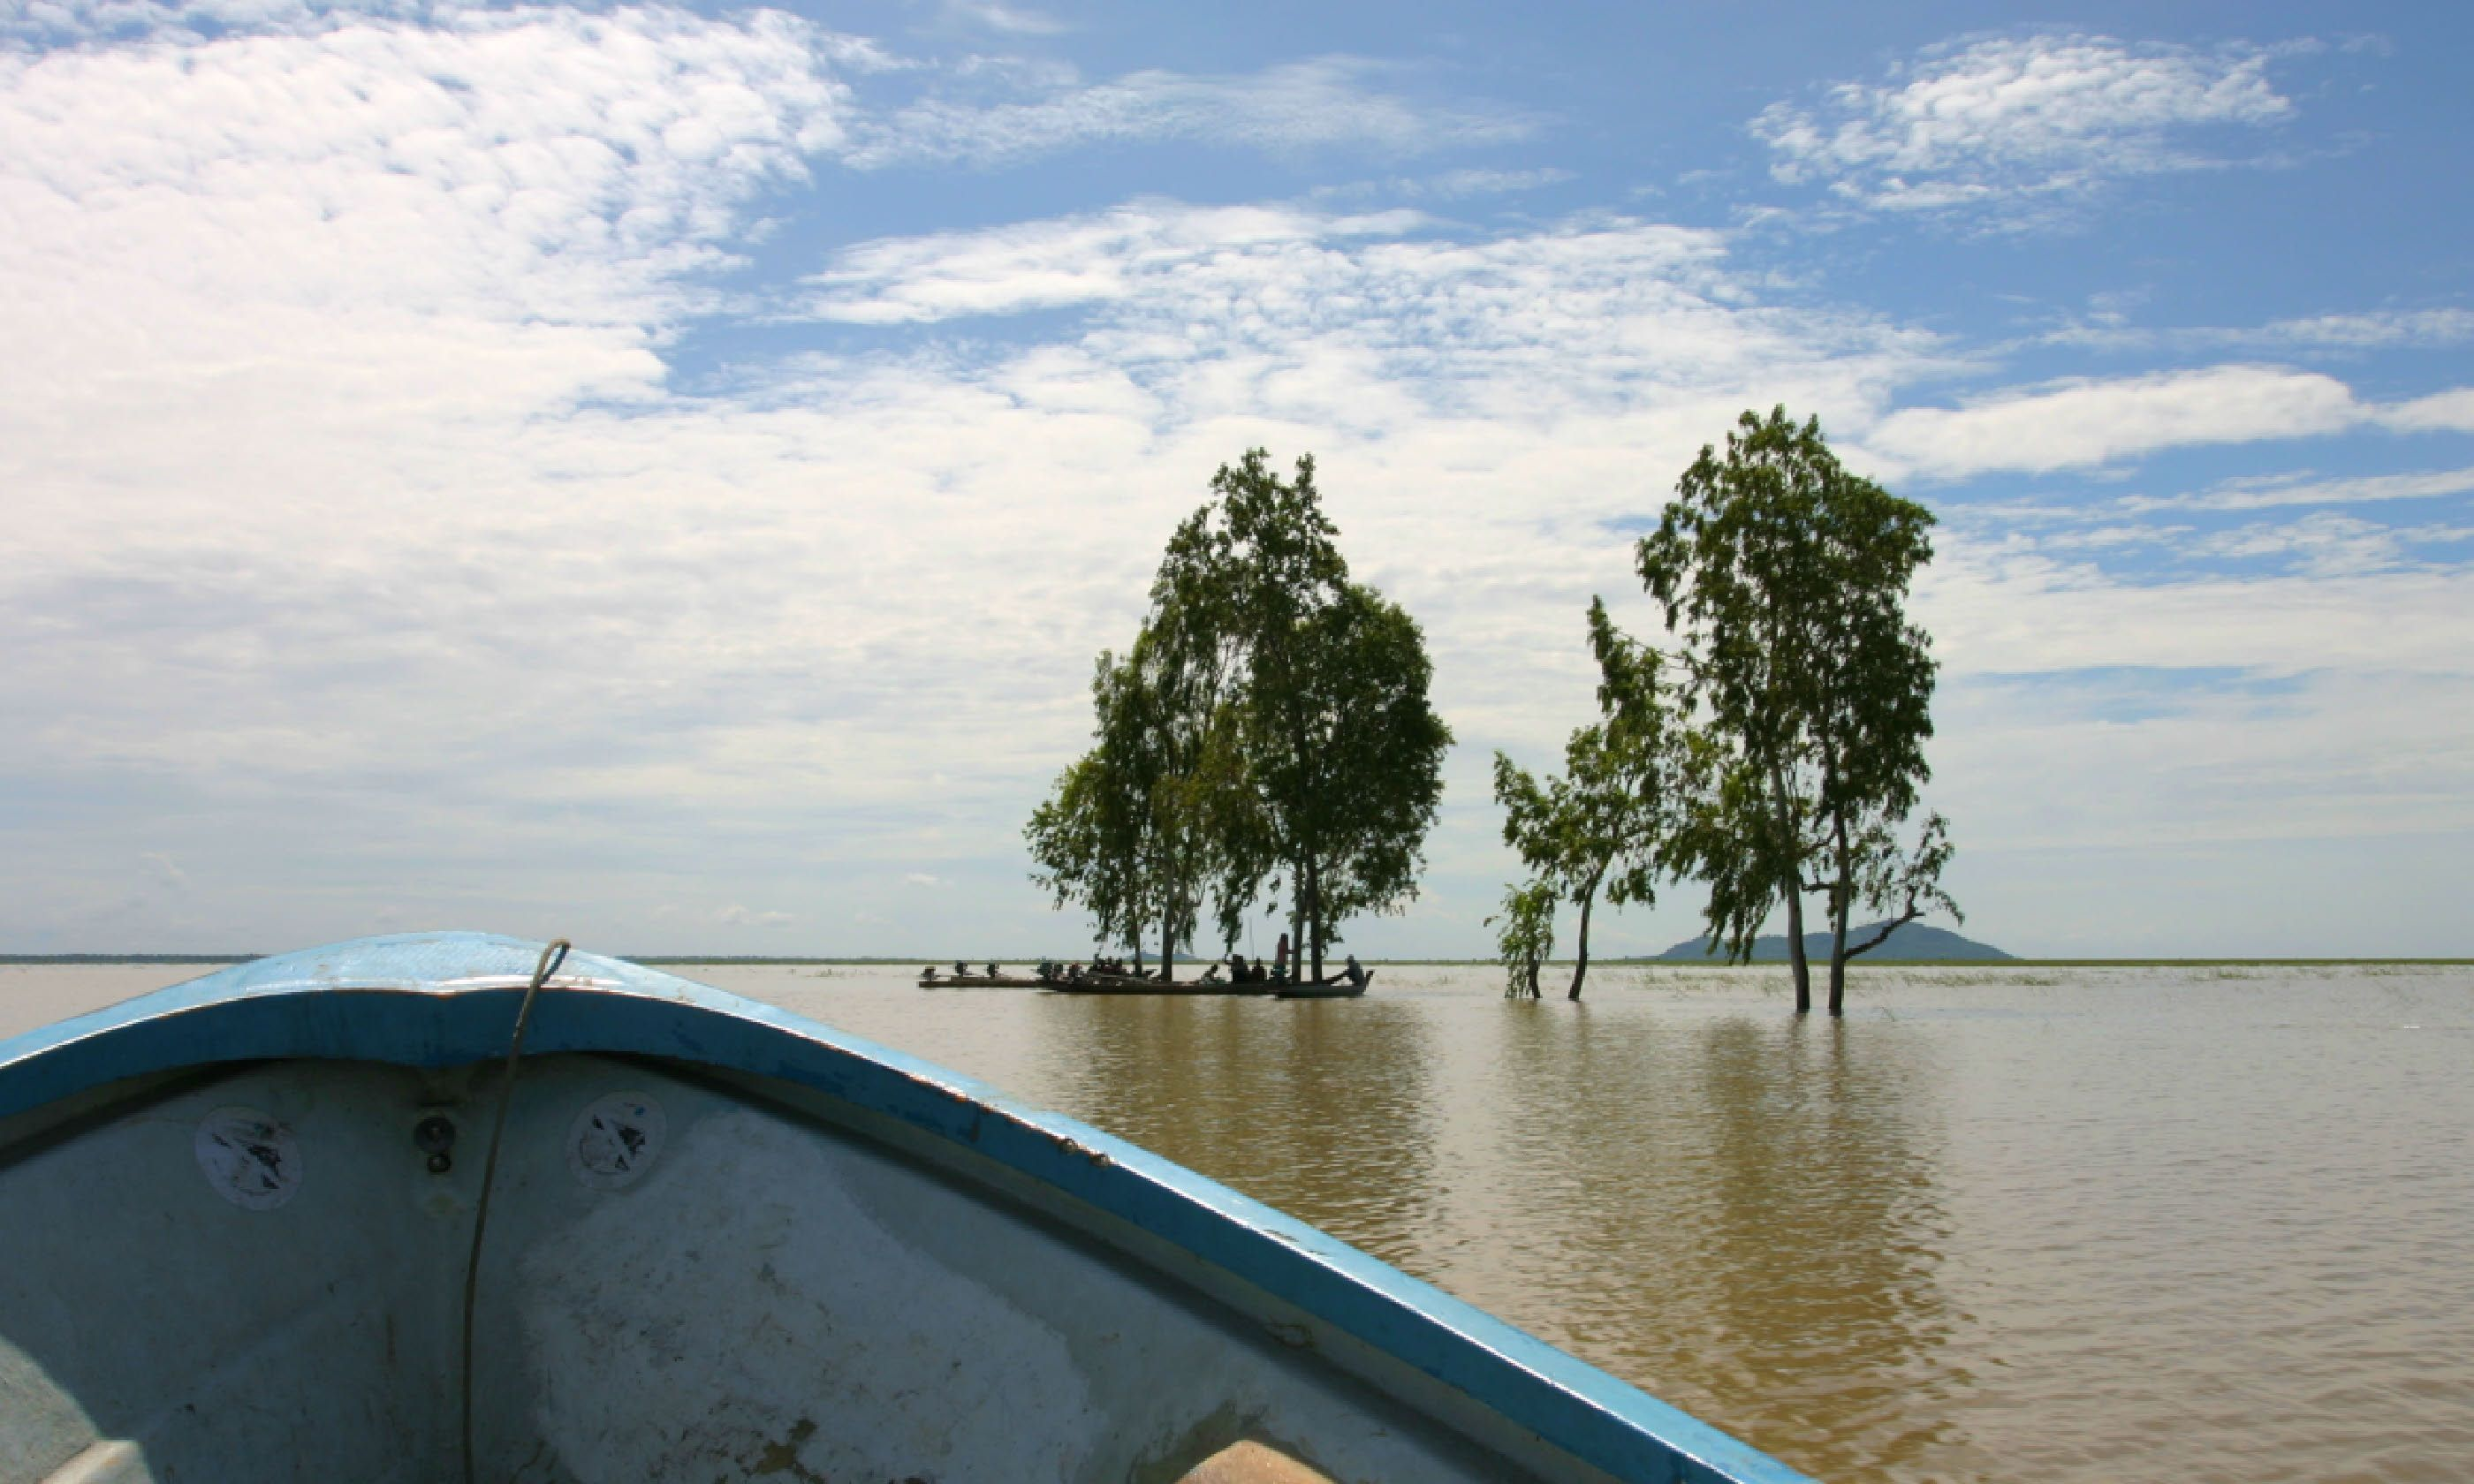 On the way to temple of Phnom Da, wet season (Shutterstock)